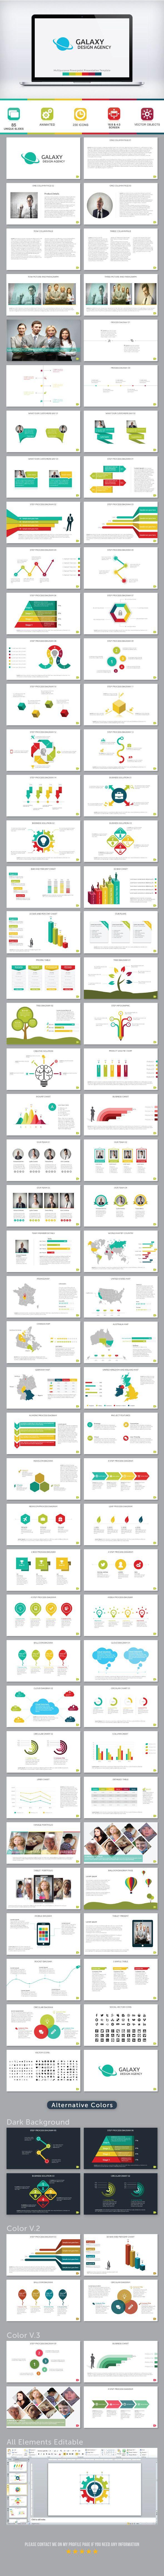 Galaxy PowerPoint Presentation Template